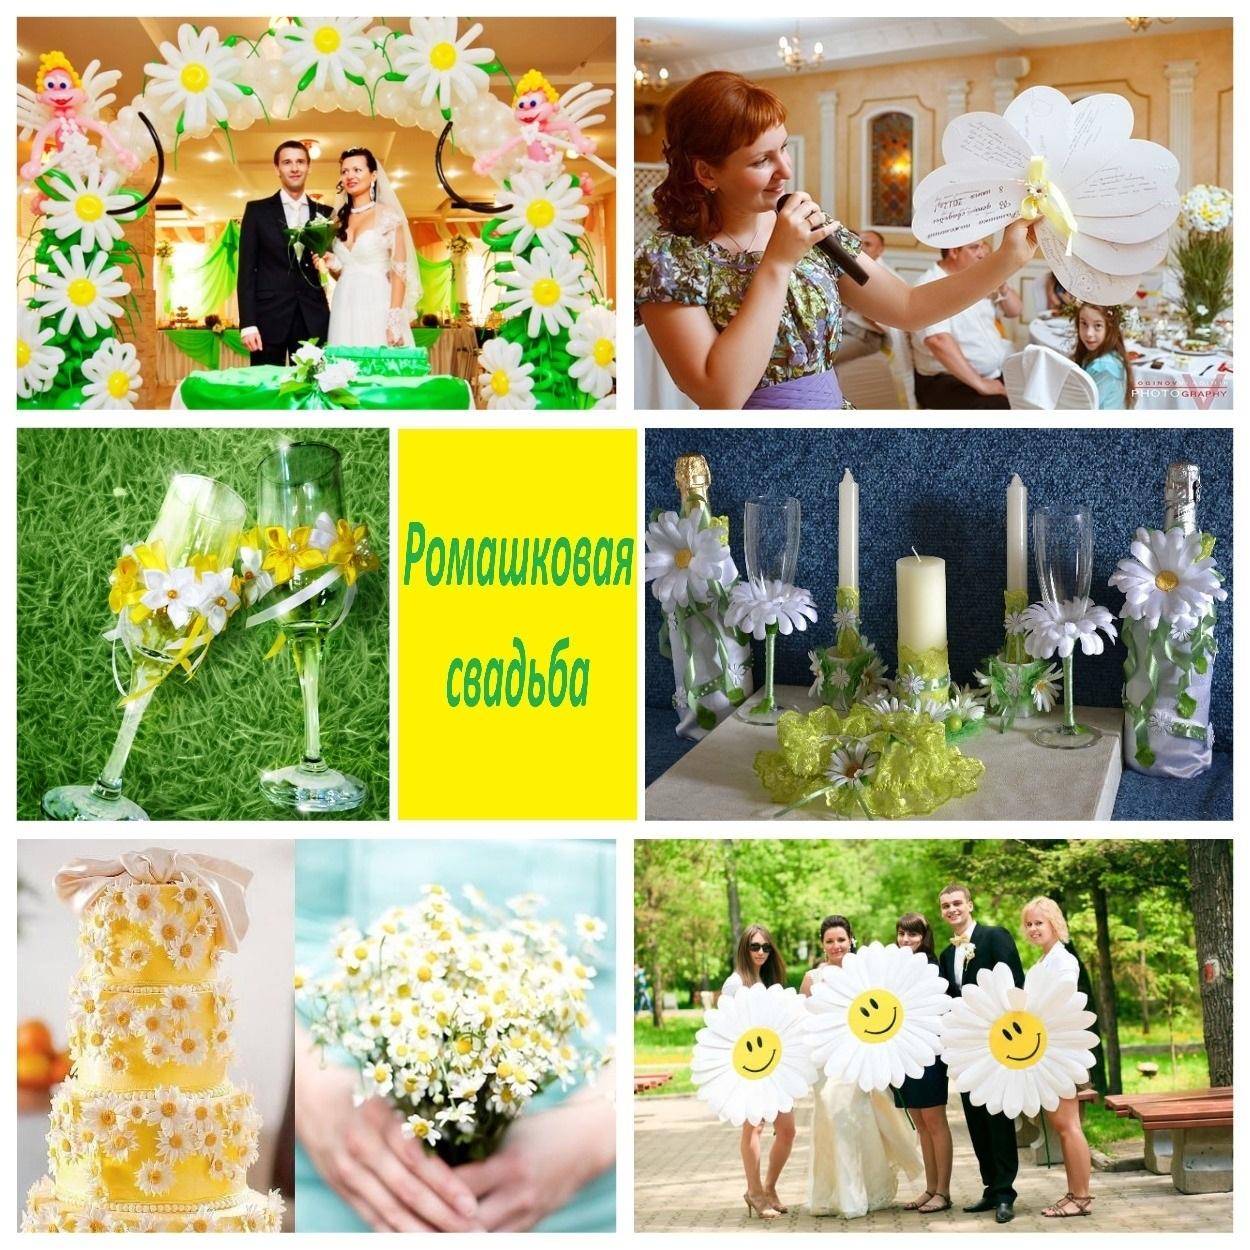 Картинки ромашковая свадьба